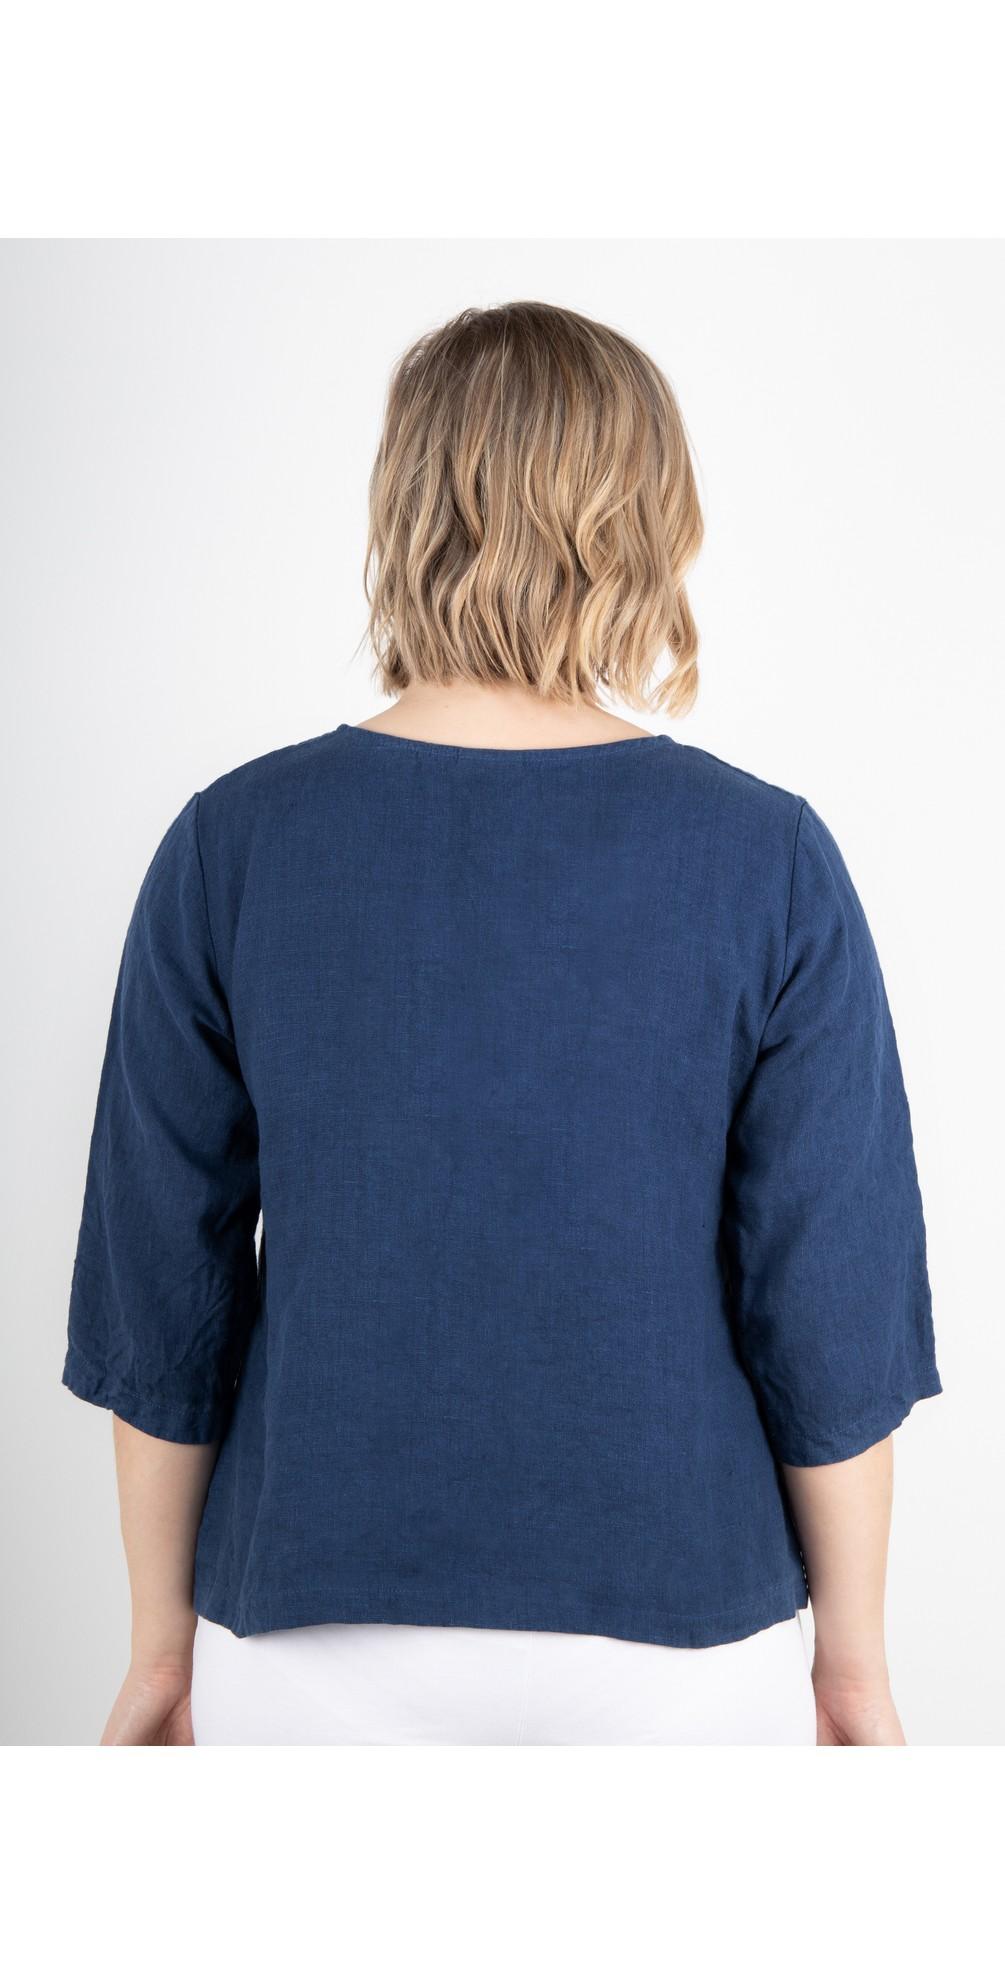 Erin Linen Three Quarter Sleeve Two Pocket Top main image